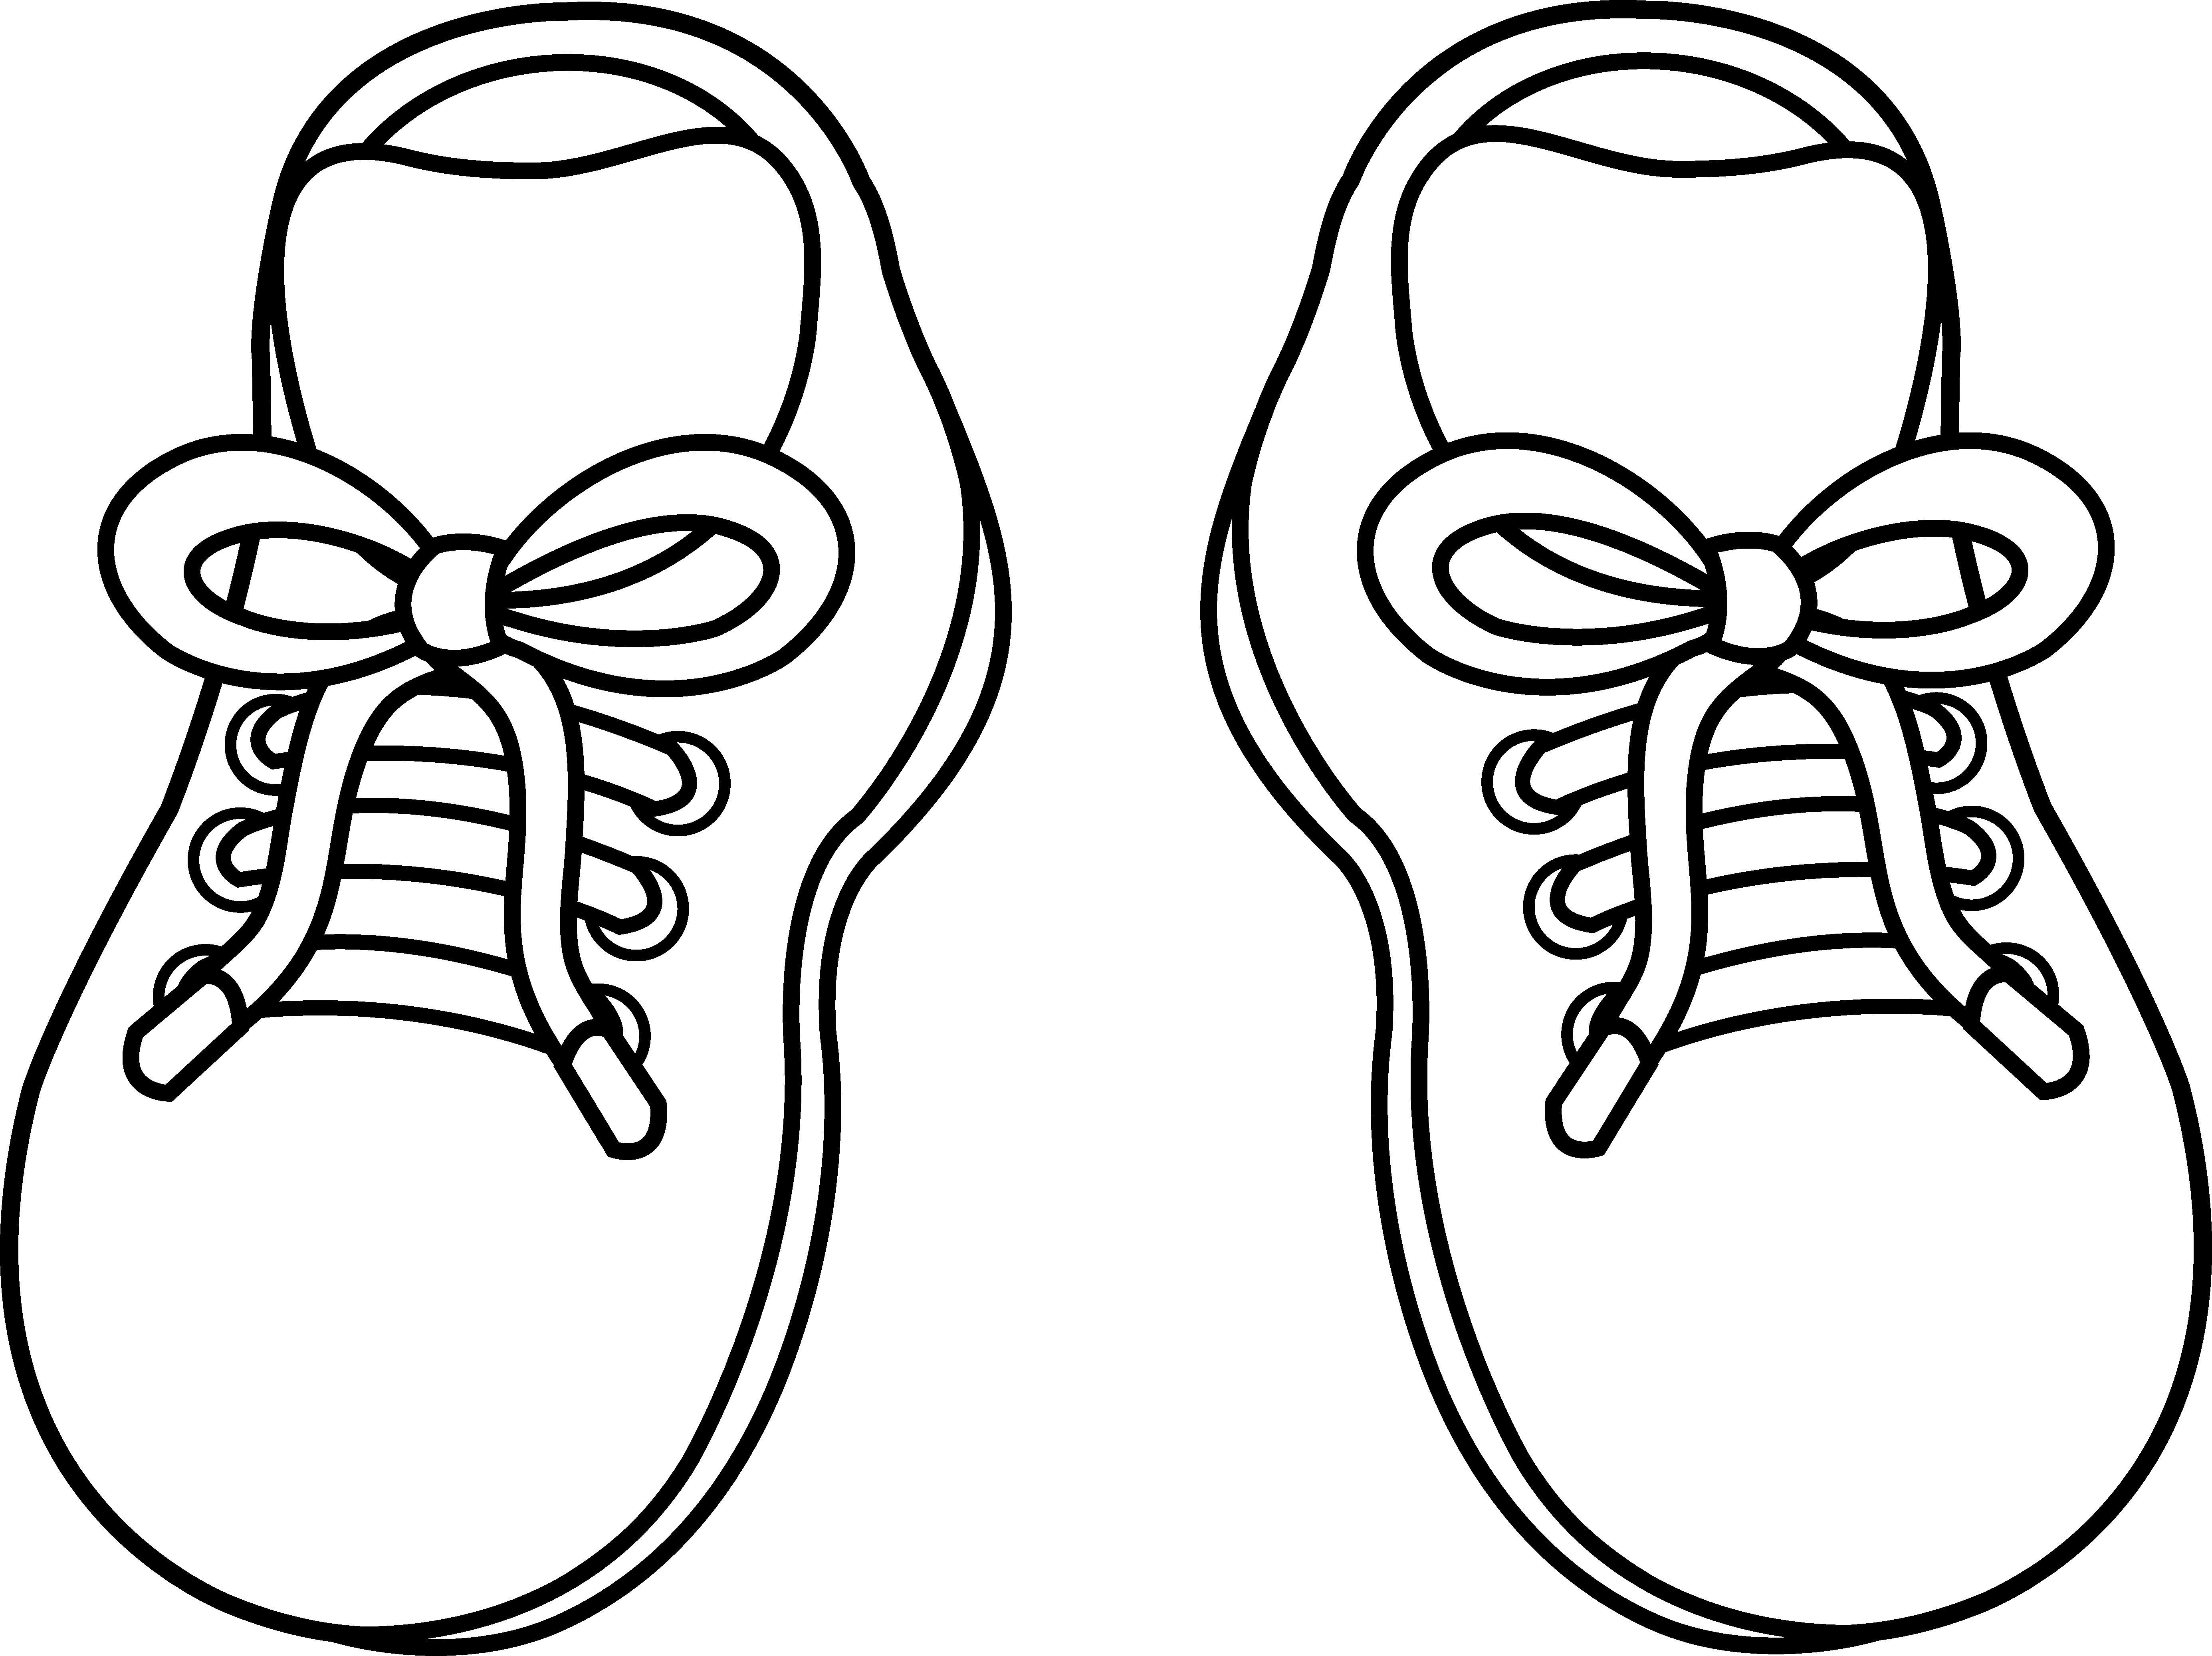 5540x4147 Ot Handwriting Shoes Clipart, Shoes